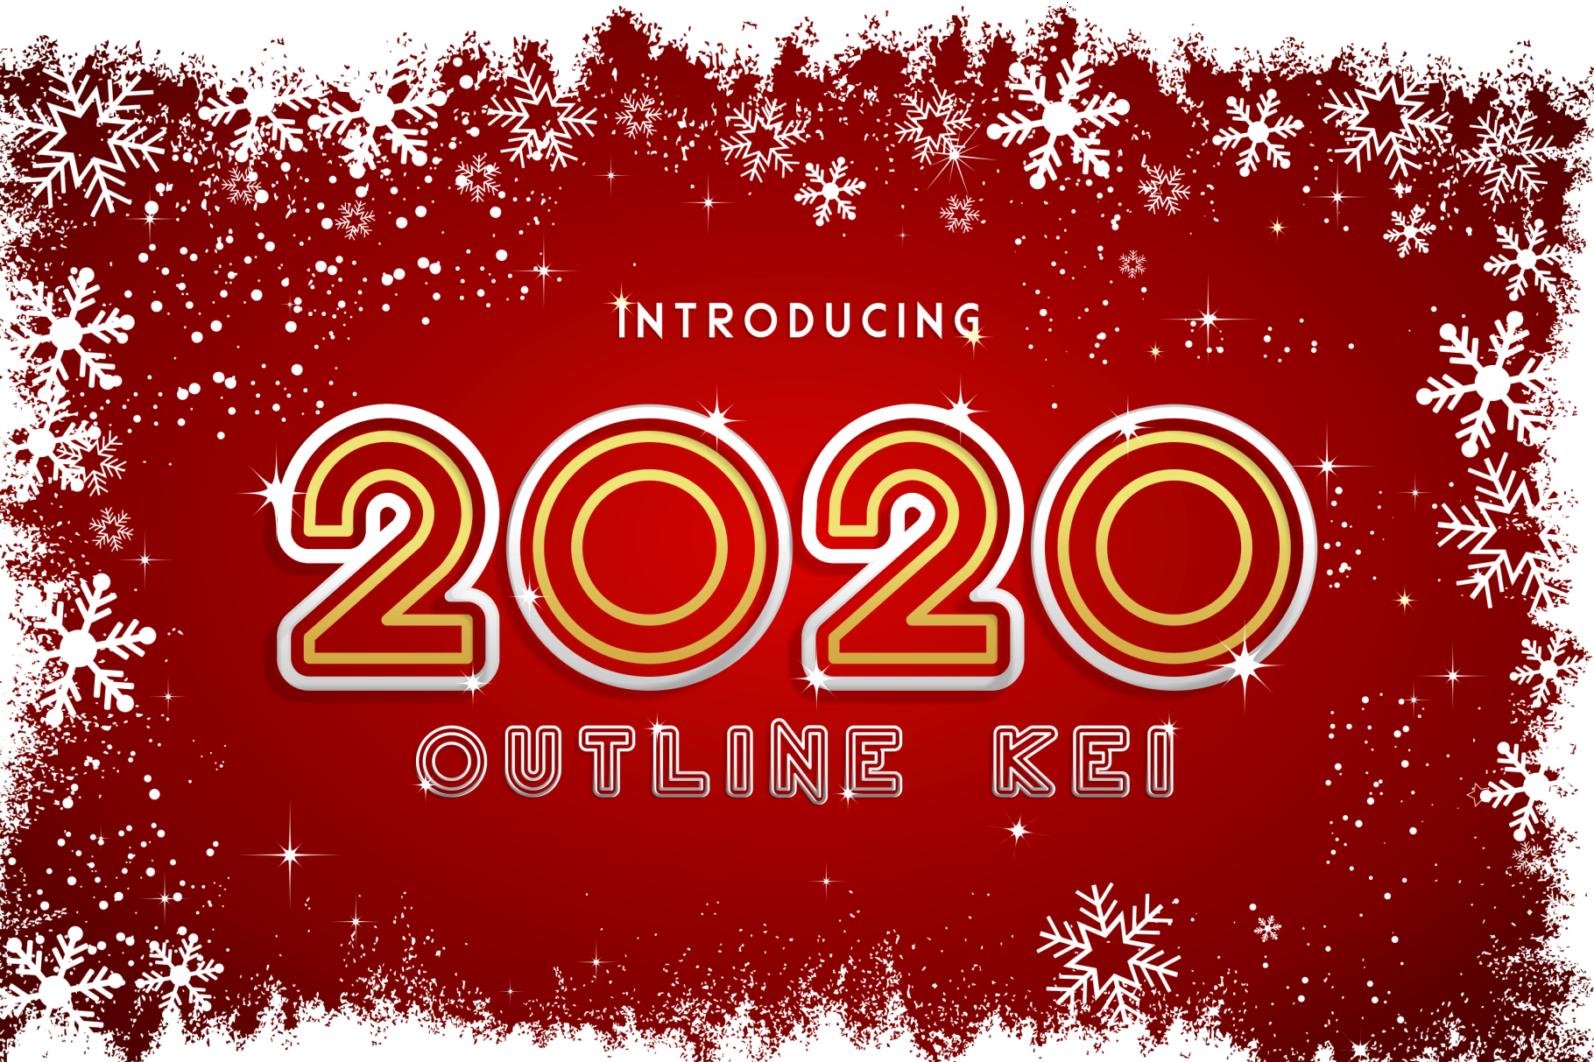 Creative Font Bundle - Preview 2020 Outline Kei 1 -